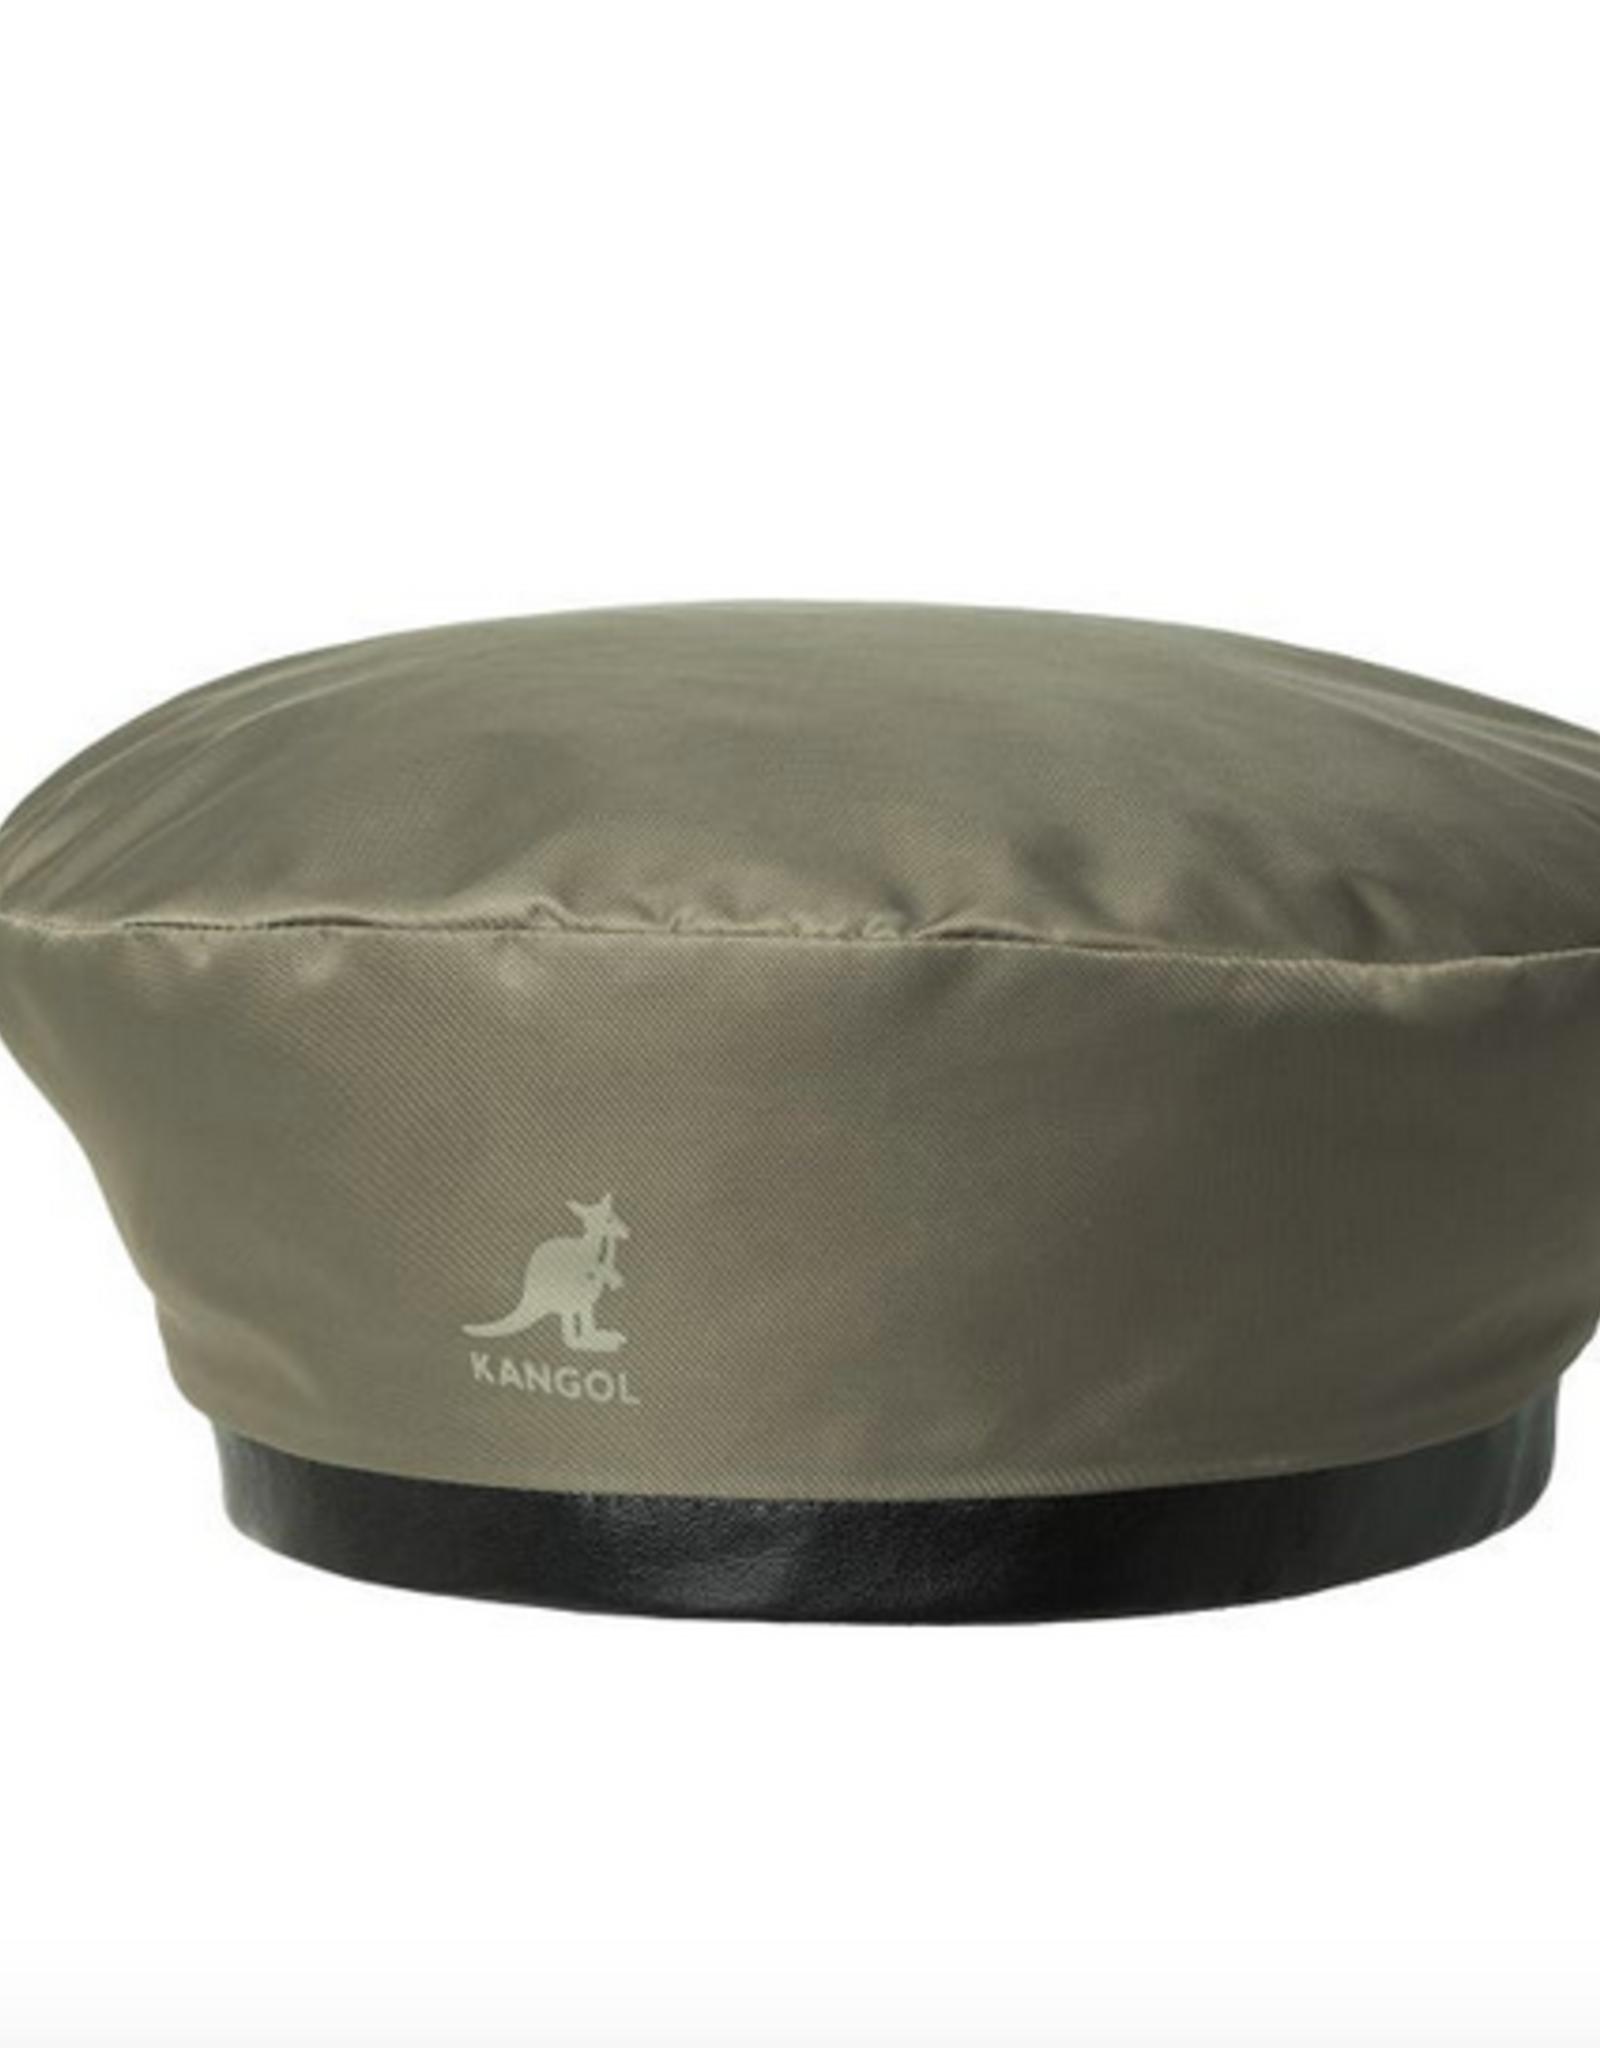 kangol Plush beret white S/M